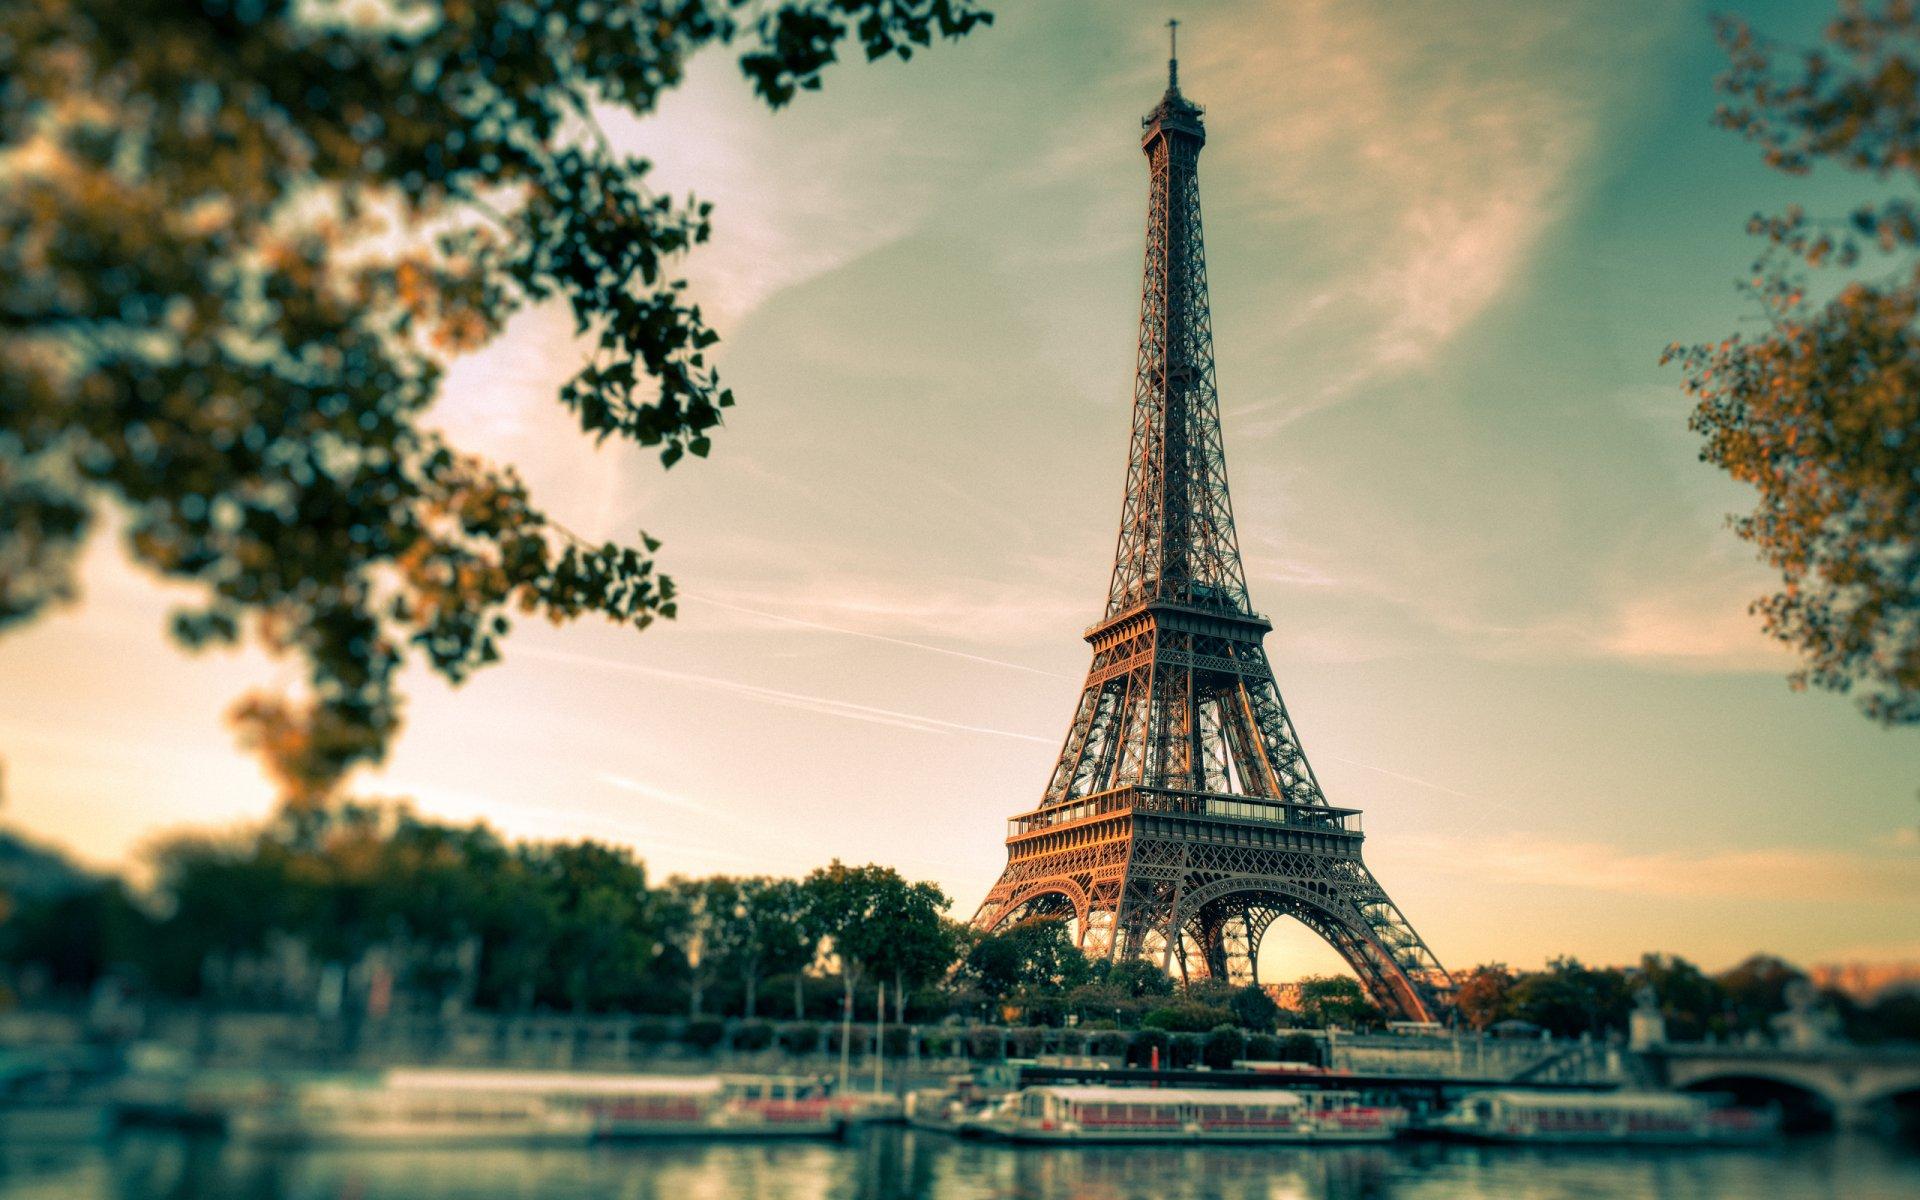 Обои Эйфелева башня, рисунок. Города foto 13